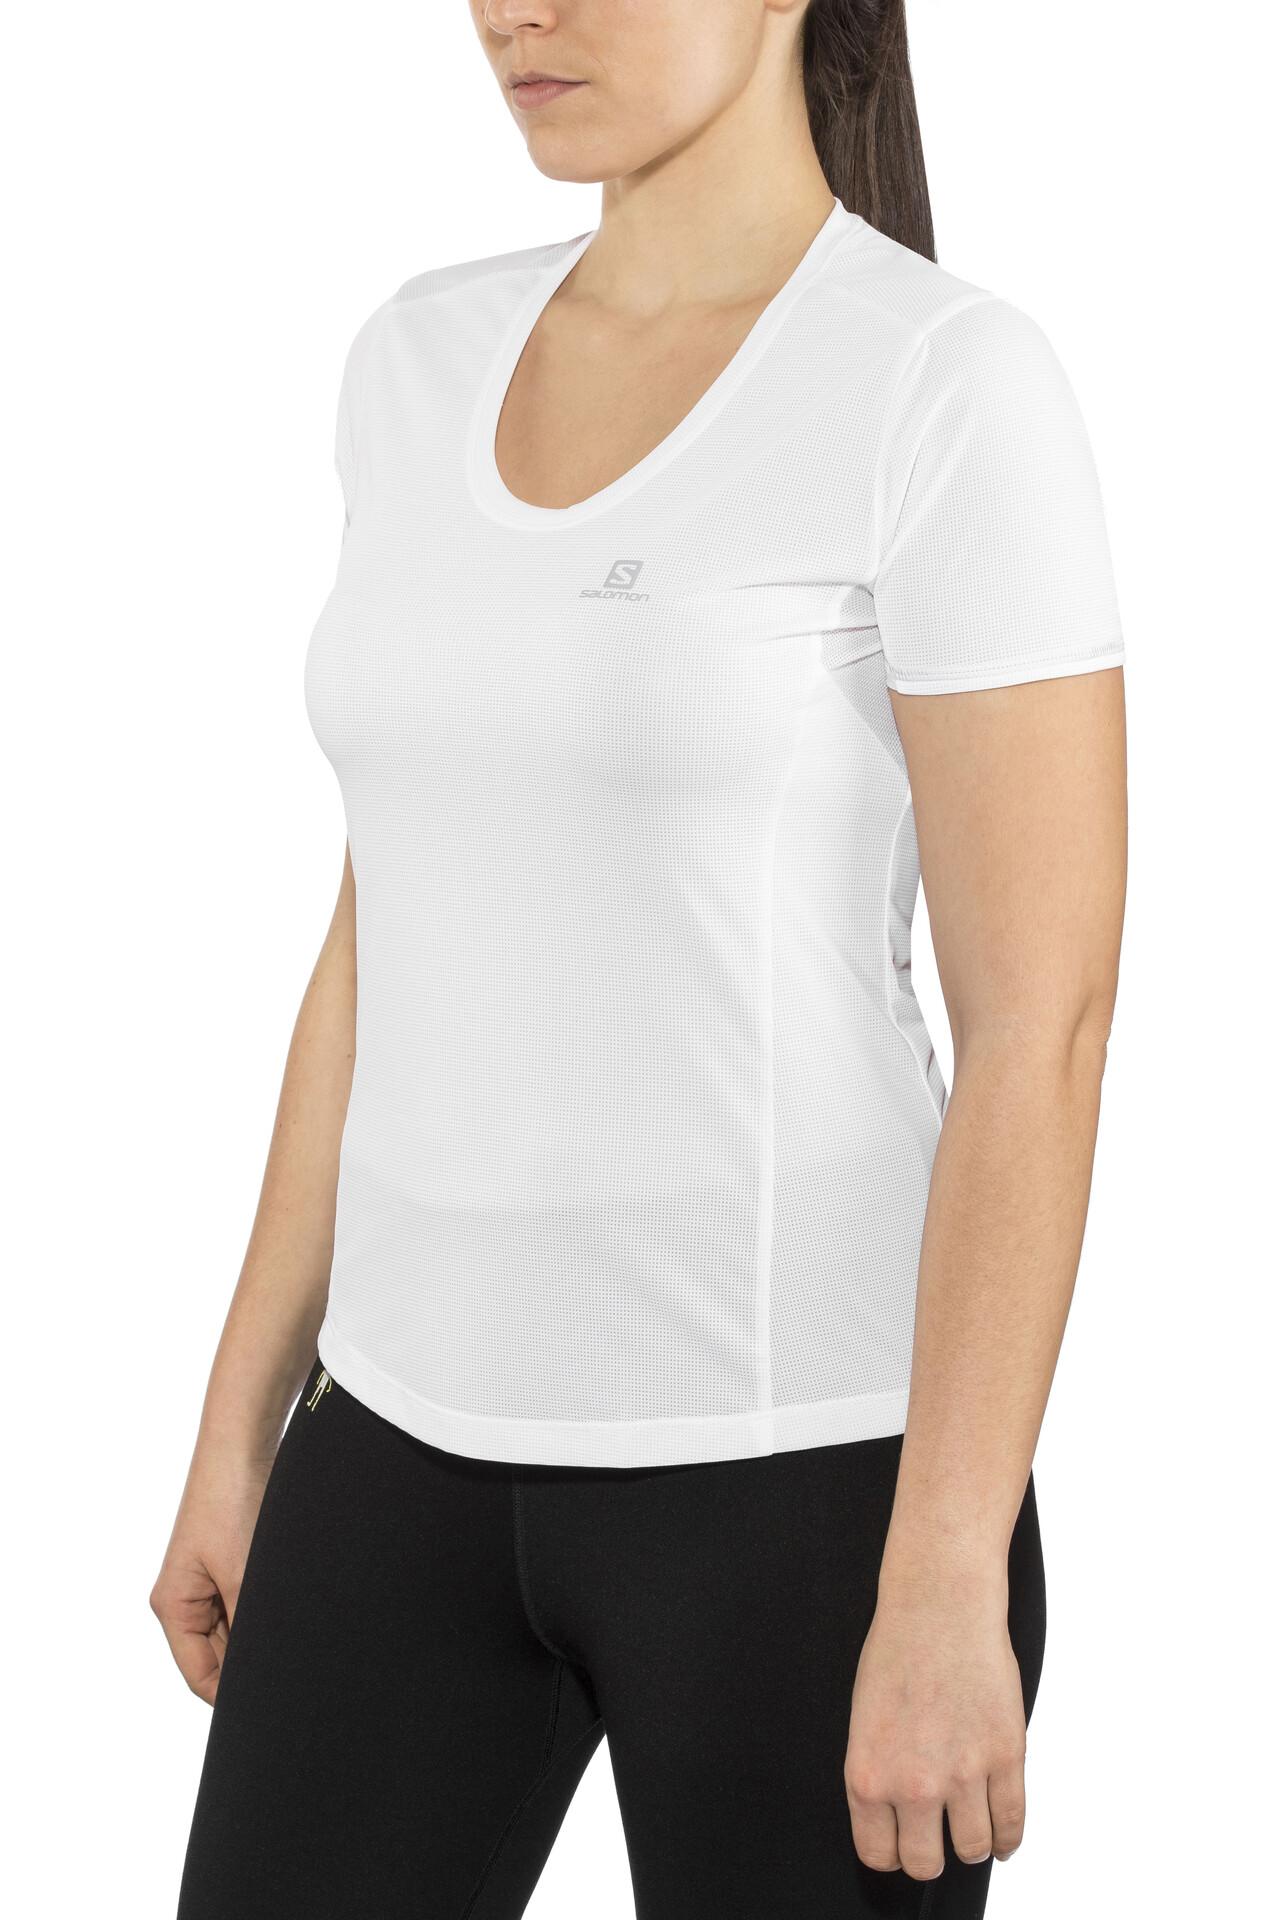 Salomon Agile T shirt Femme, white